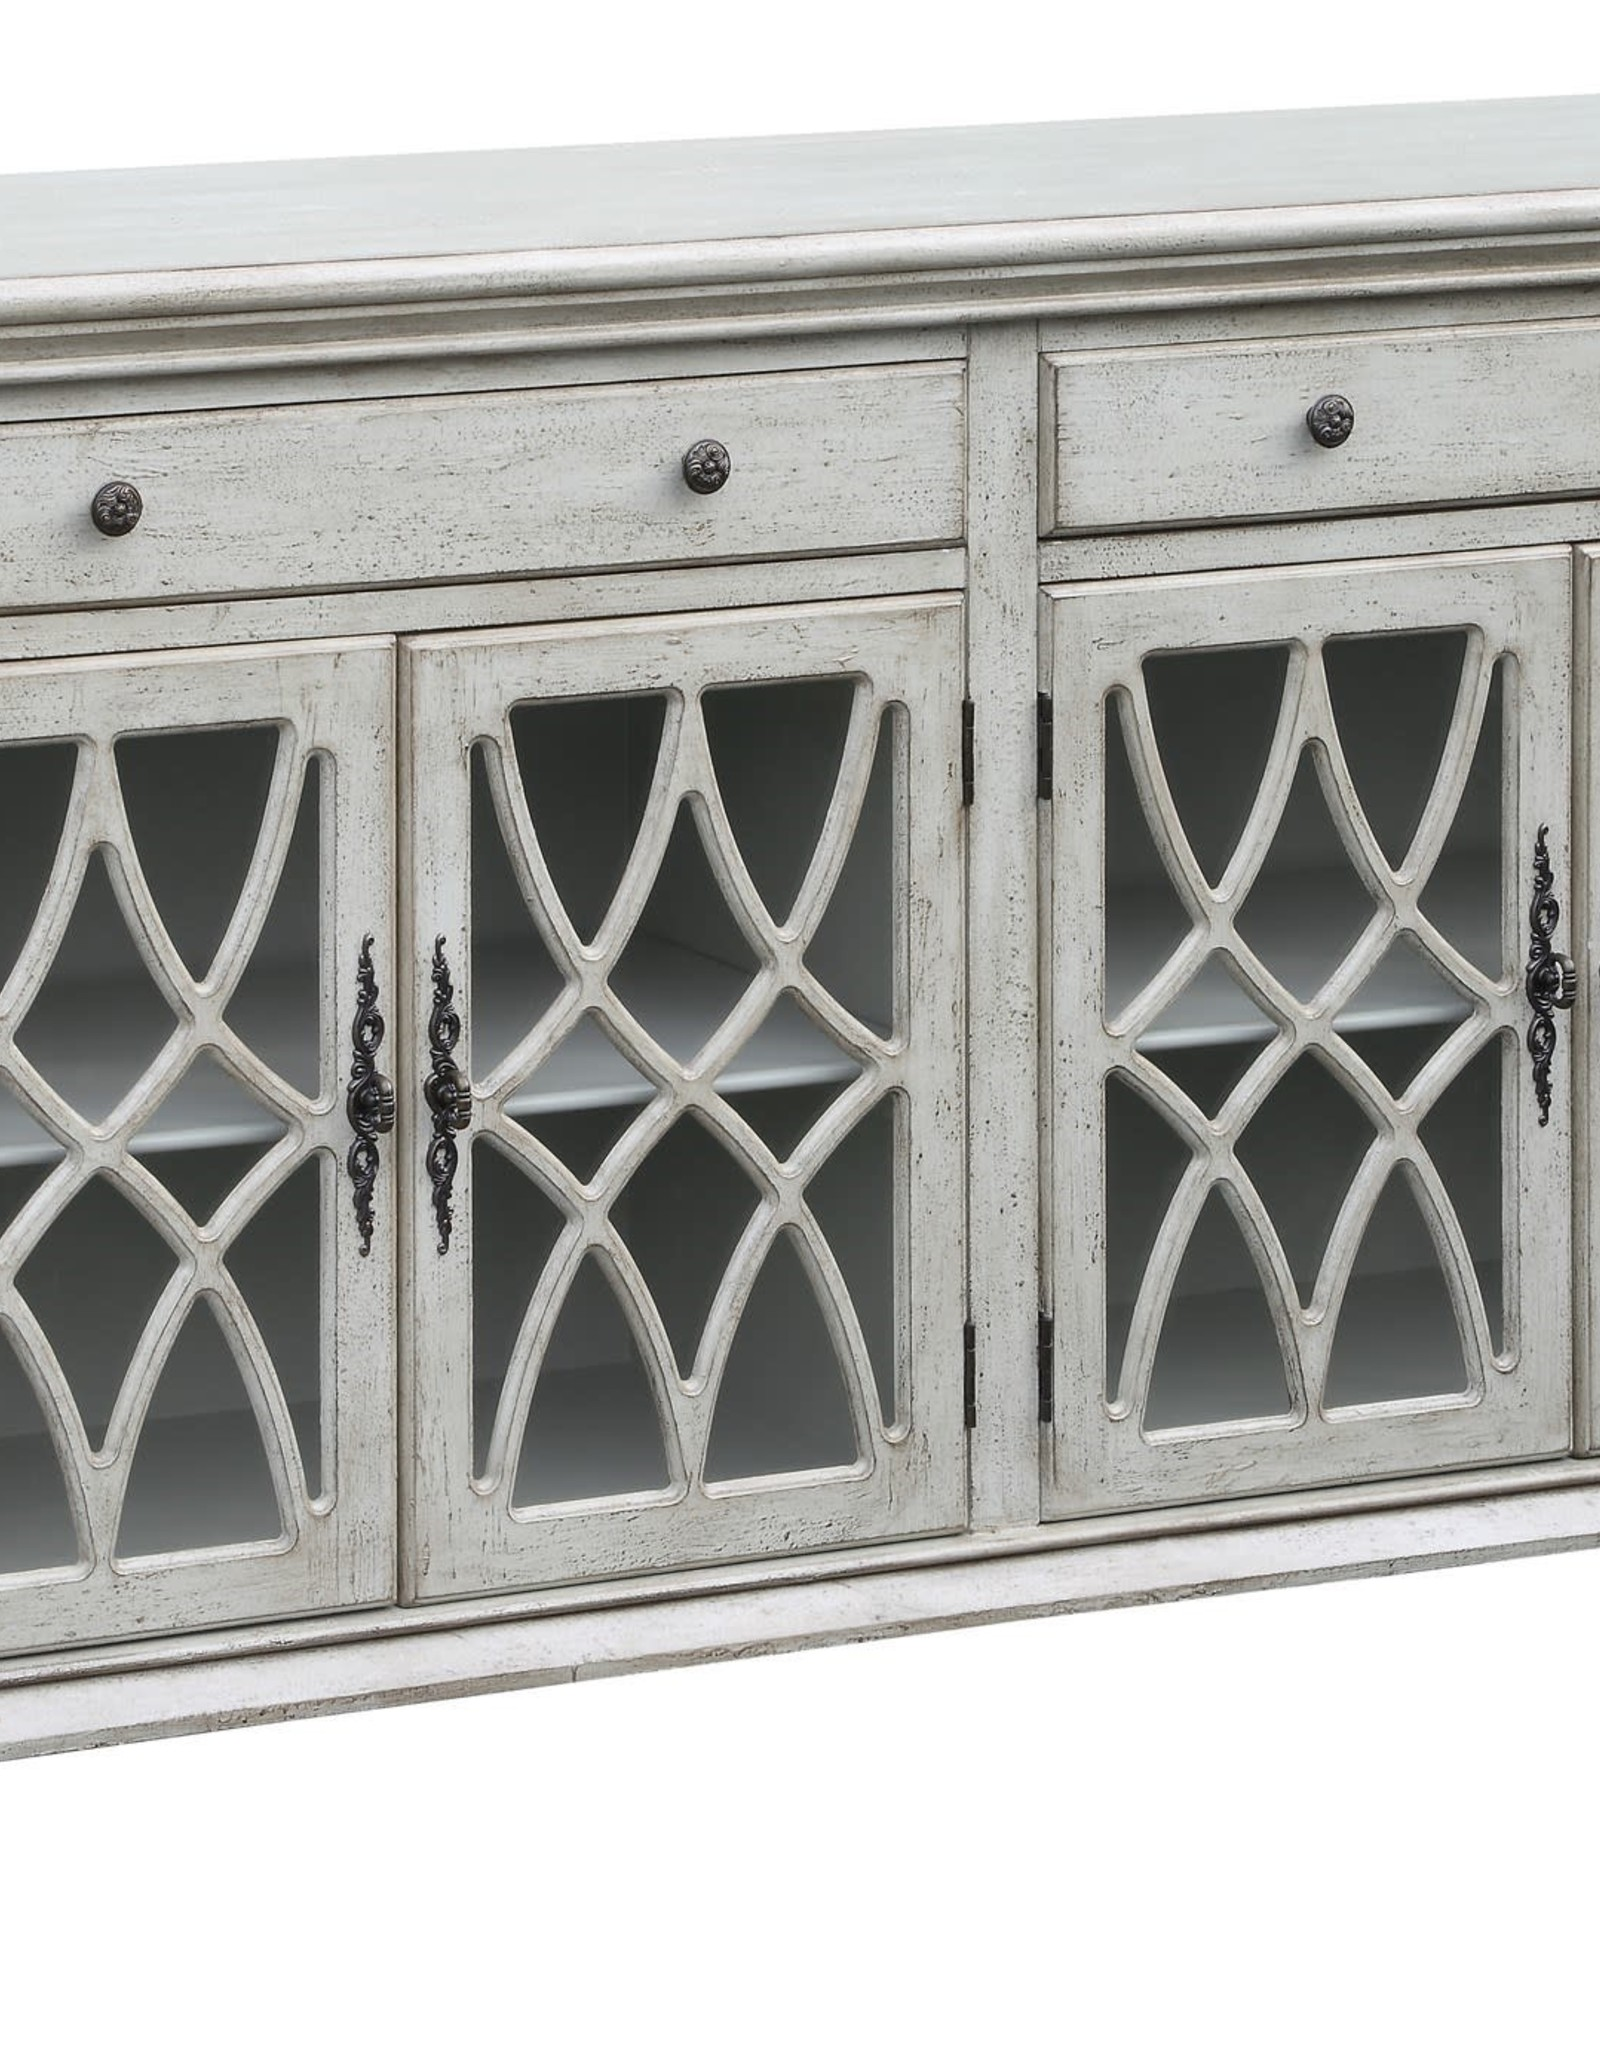 Crestview Paxton Pale Grey Sideboard